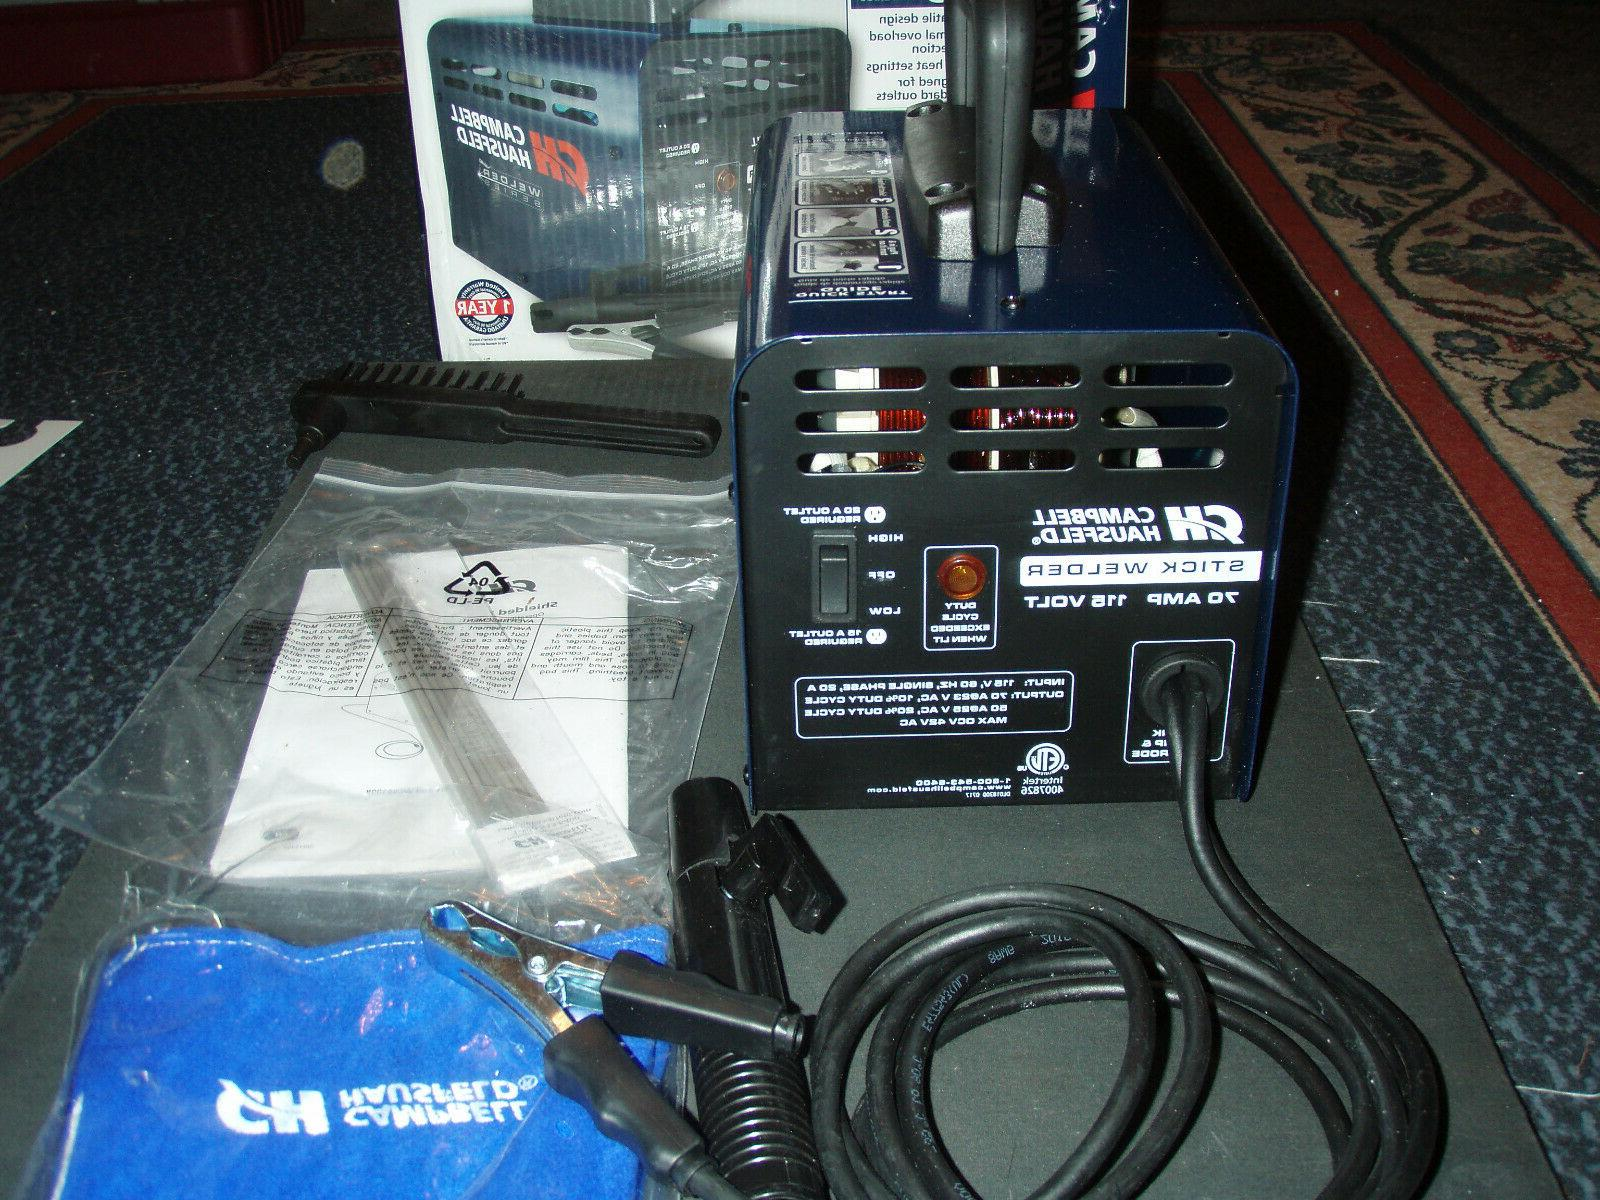 Campbell AMP Stick WS099098AV